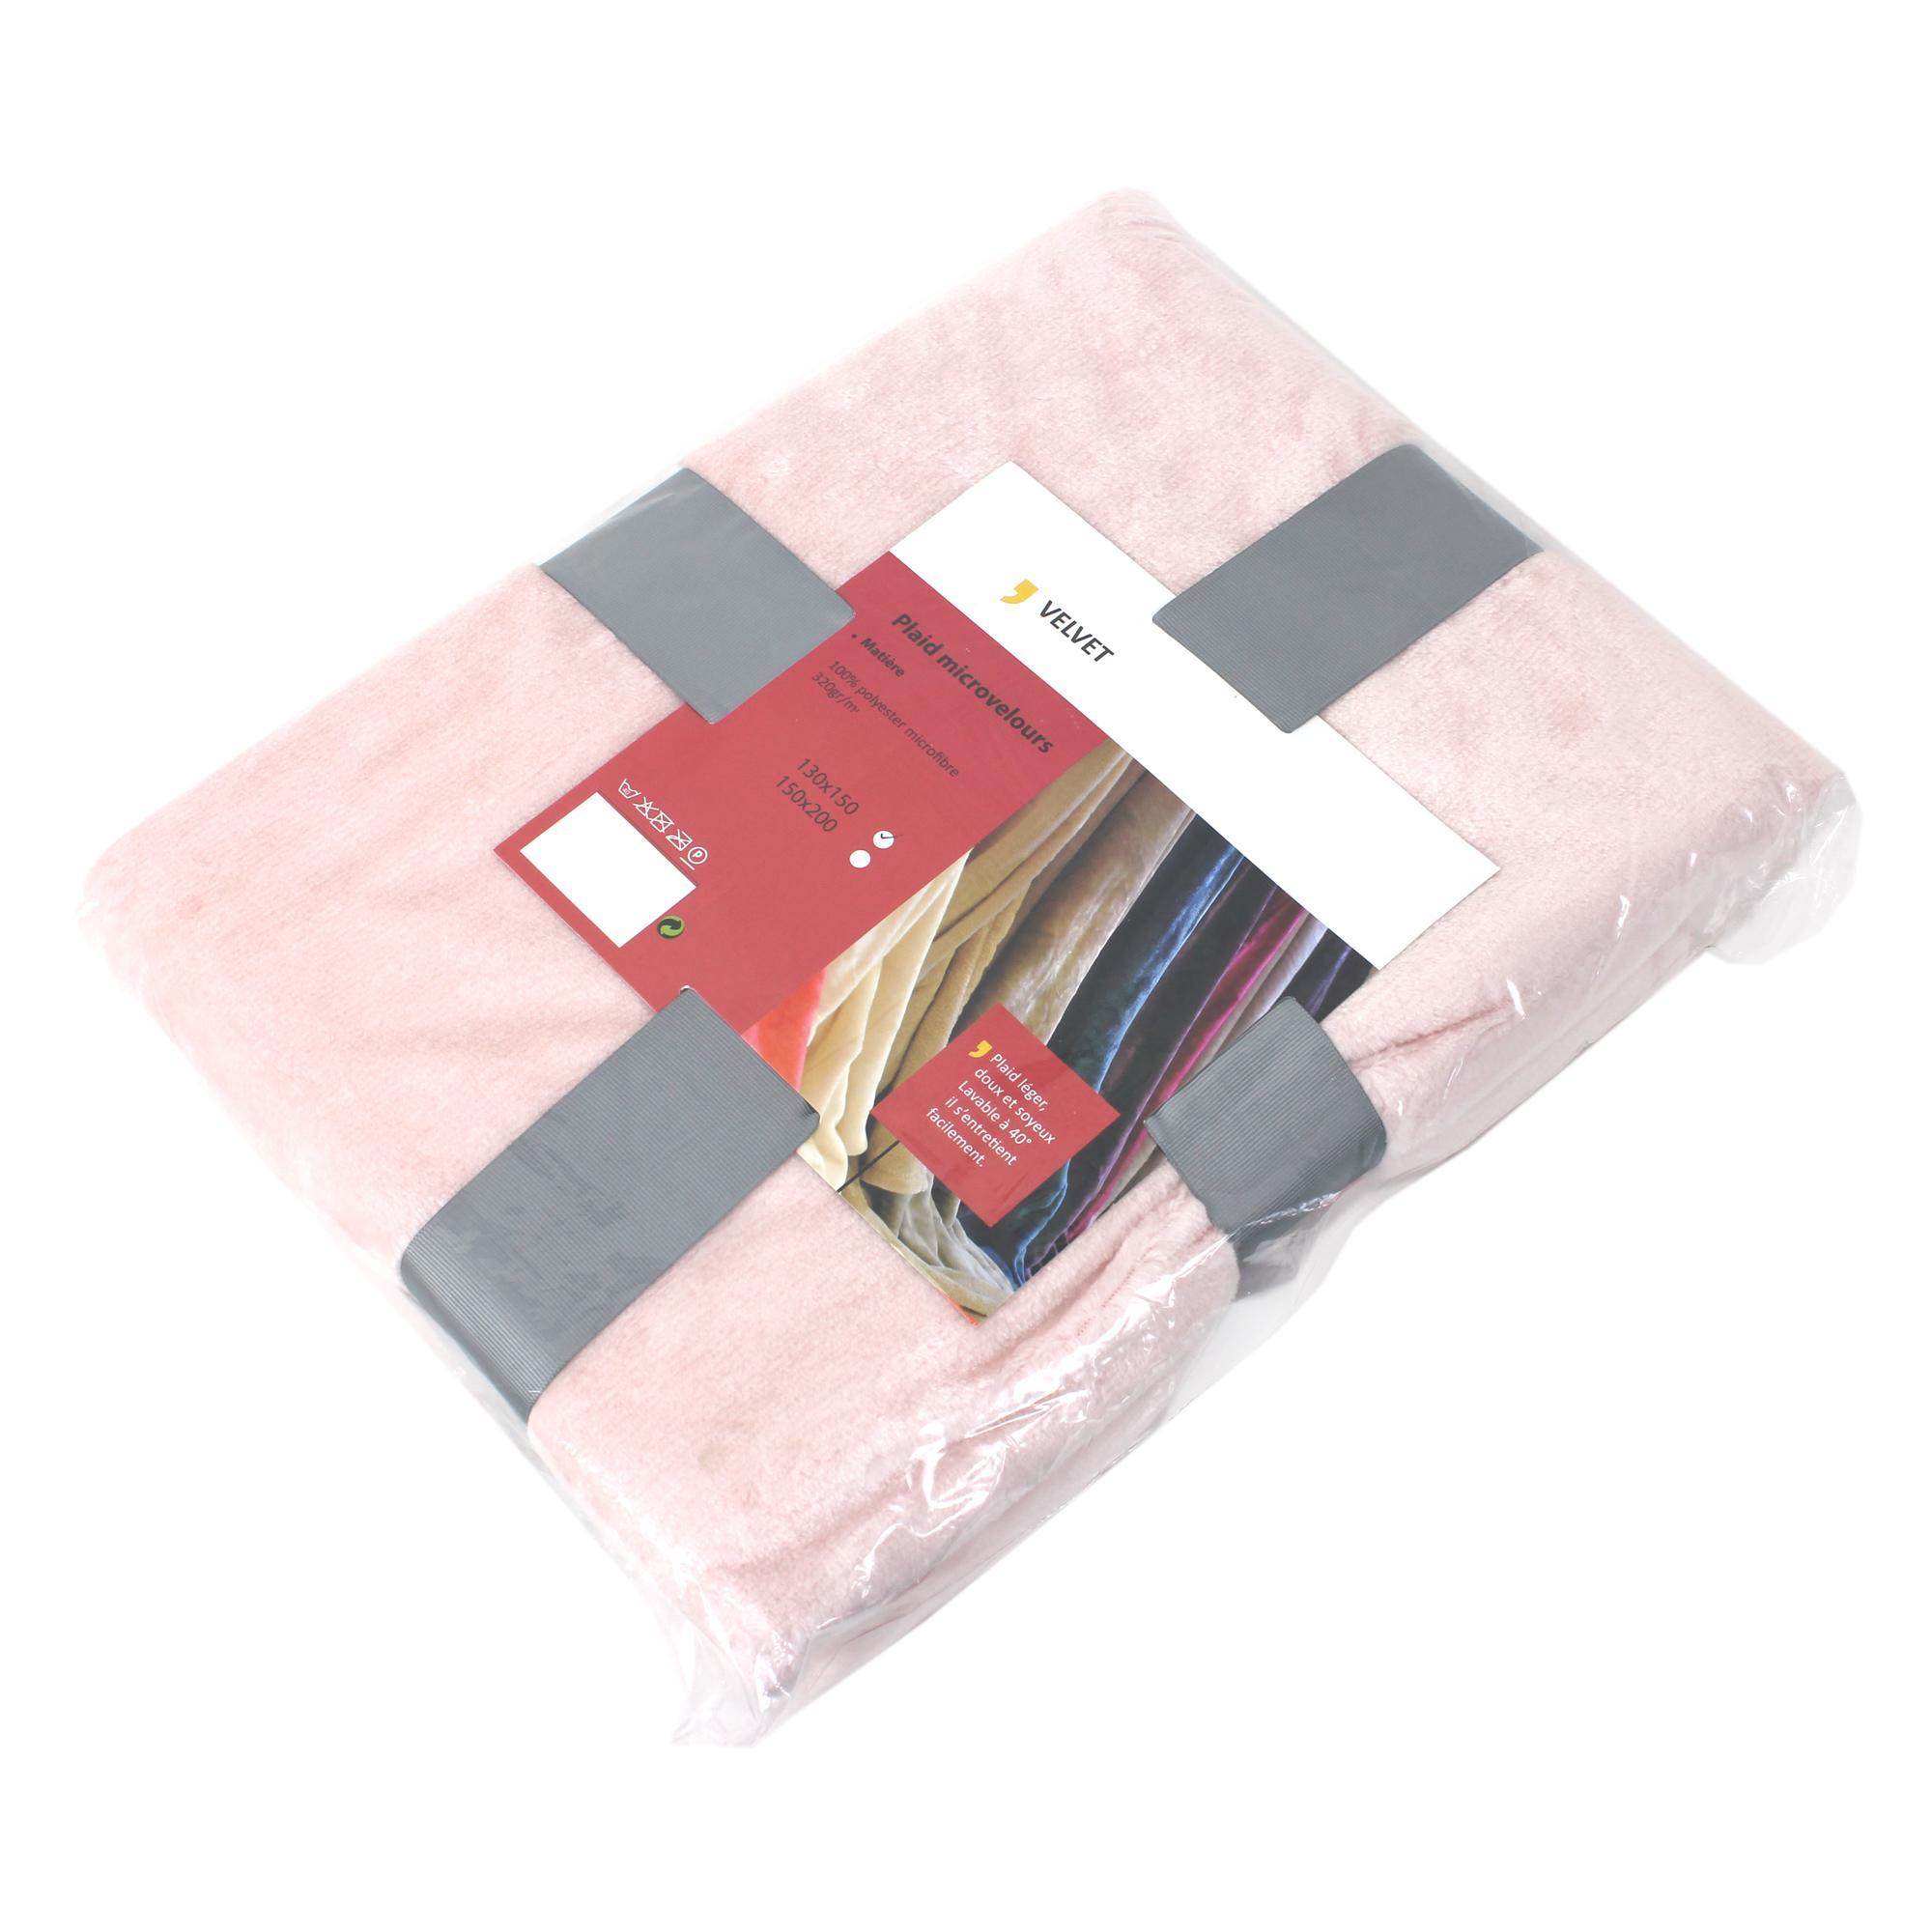 plaid polaire microvelours 130x150 cm velvet rose poudre rose 100 polyester 320 g m2 traitement. Black Bedroom Furniture Sets. Home Design Ideas